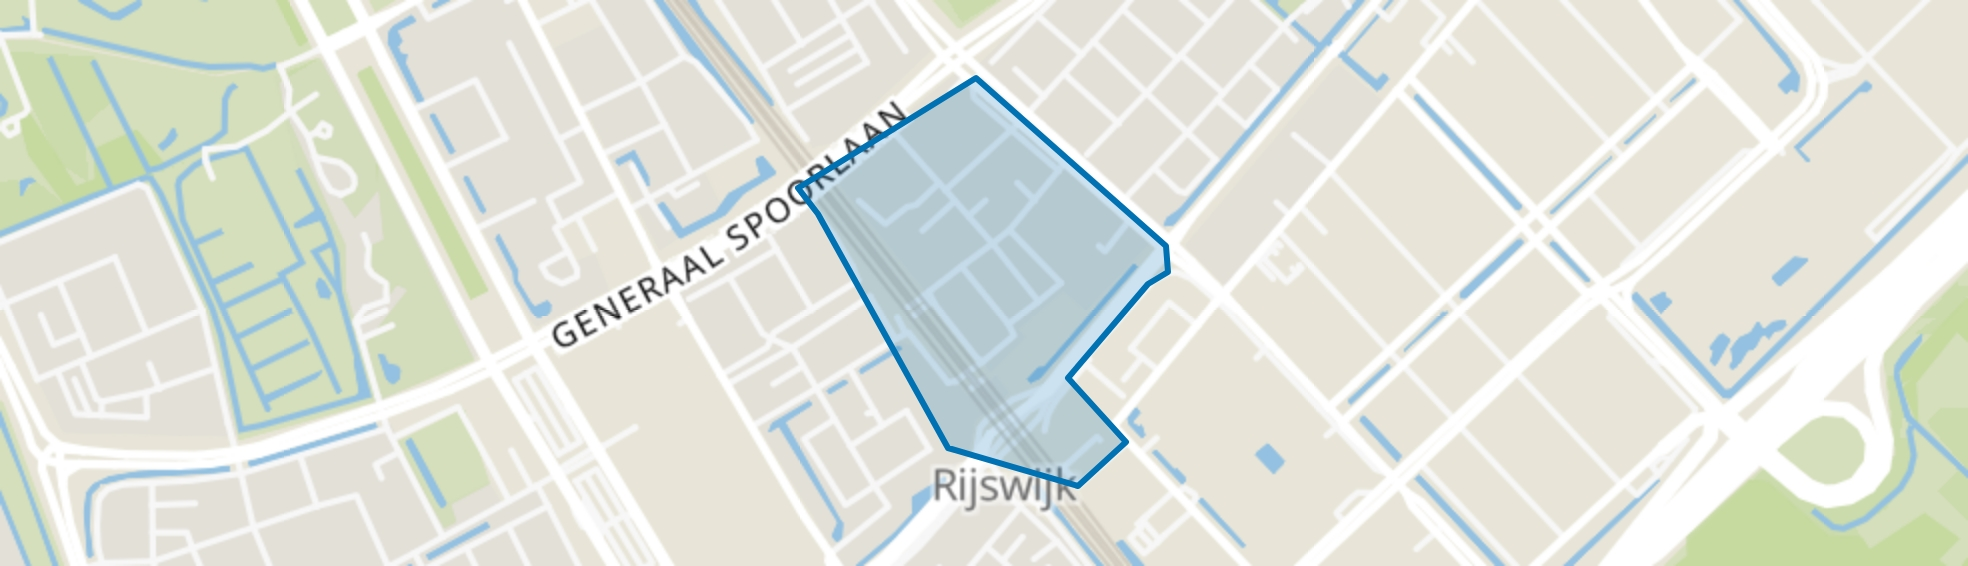 Stationskwartier, Rijswijk (ZH) map